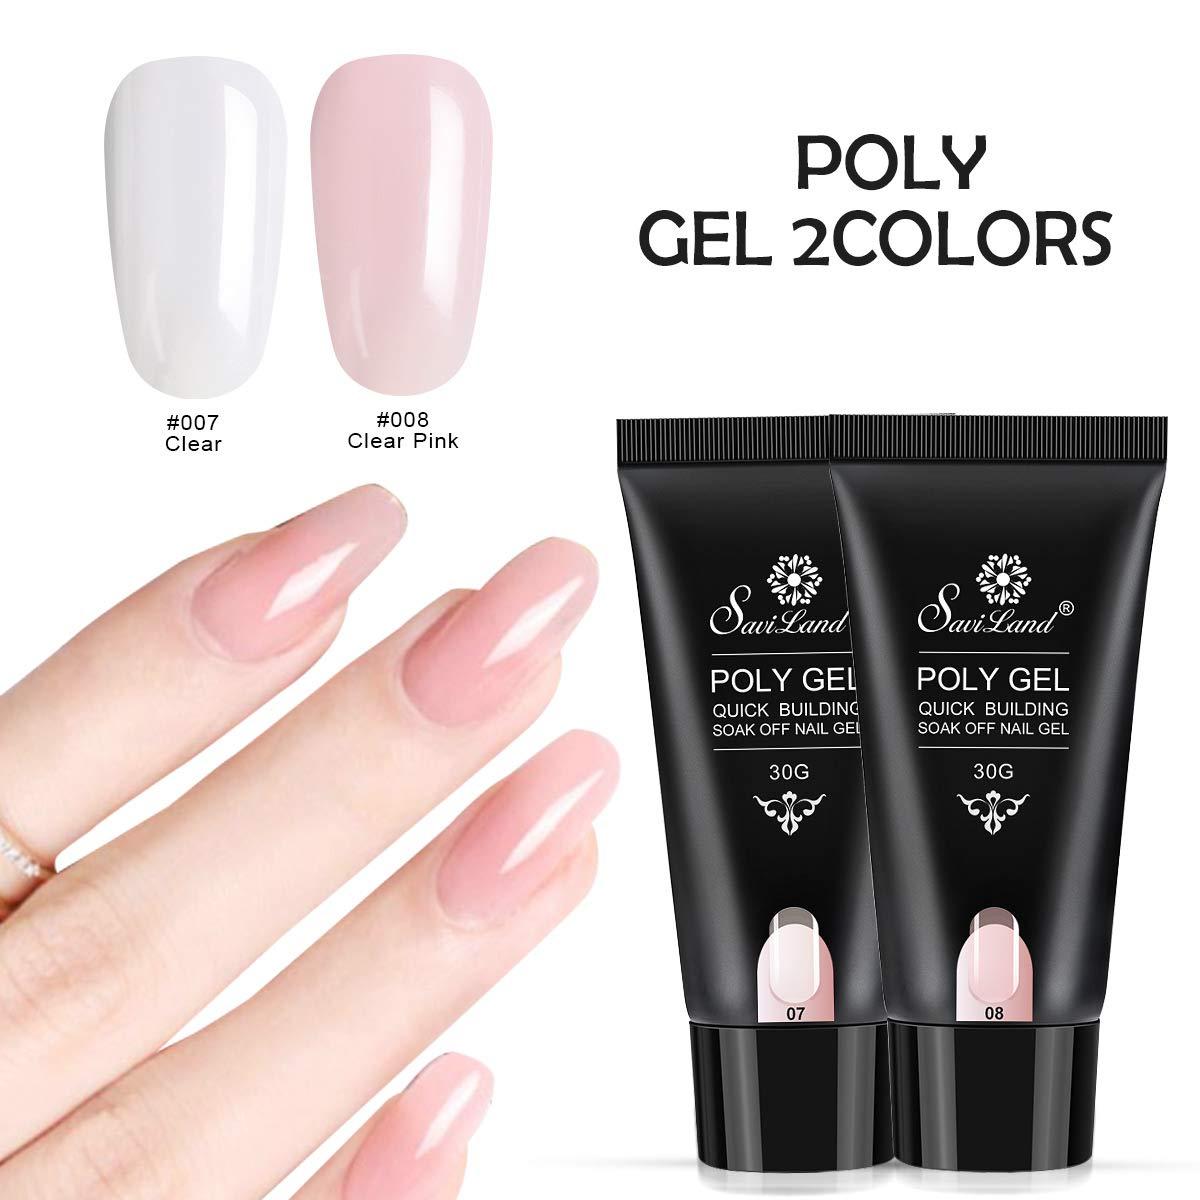 2pcs Poly Gel Nail Art Kit, Saviland UV Nail Builder Gel Finger Extension Gel Set 30ml(Clear and Clear pink) by Saviland